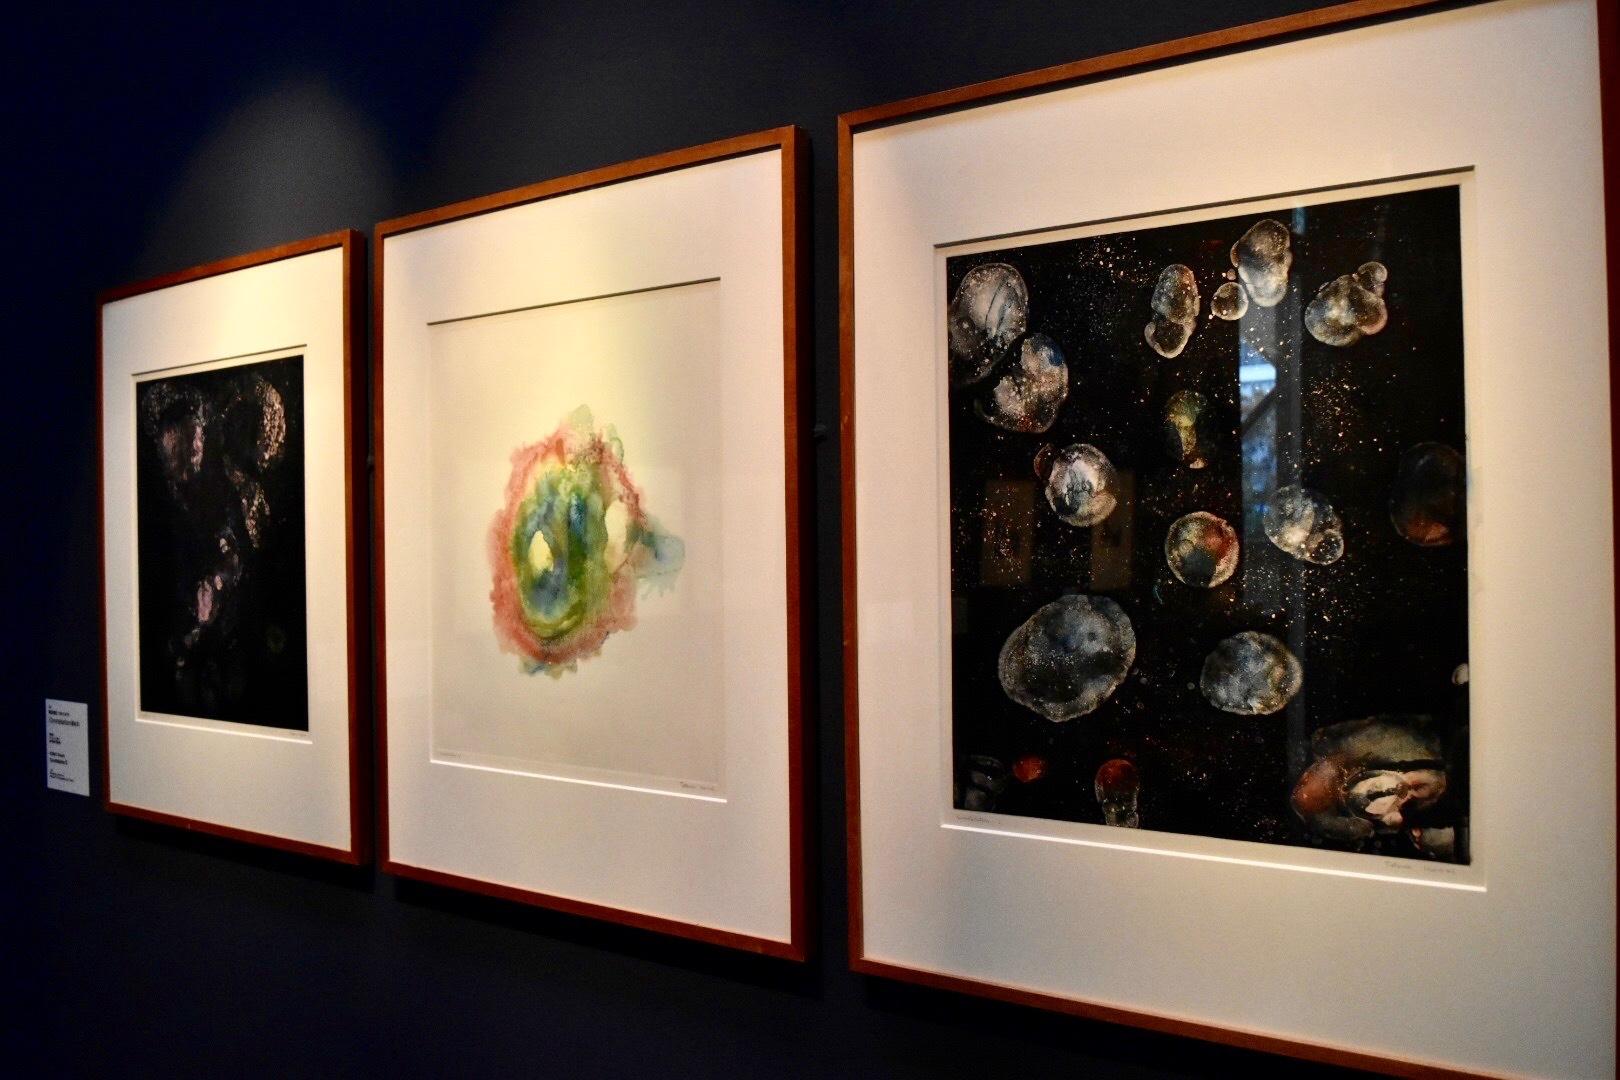 右から:《Constellation(星座Ⅰ)》 駒井哲郎 昭和46年 東京都現代美術館蔵、《Constellation(星座 II)》 同作者 同年 同館蔵、《Constellation(星座 Ⅲ)》 同作者 同年 同館蔵